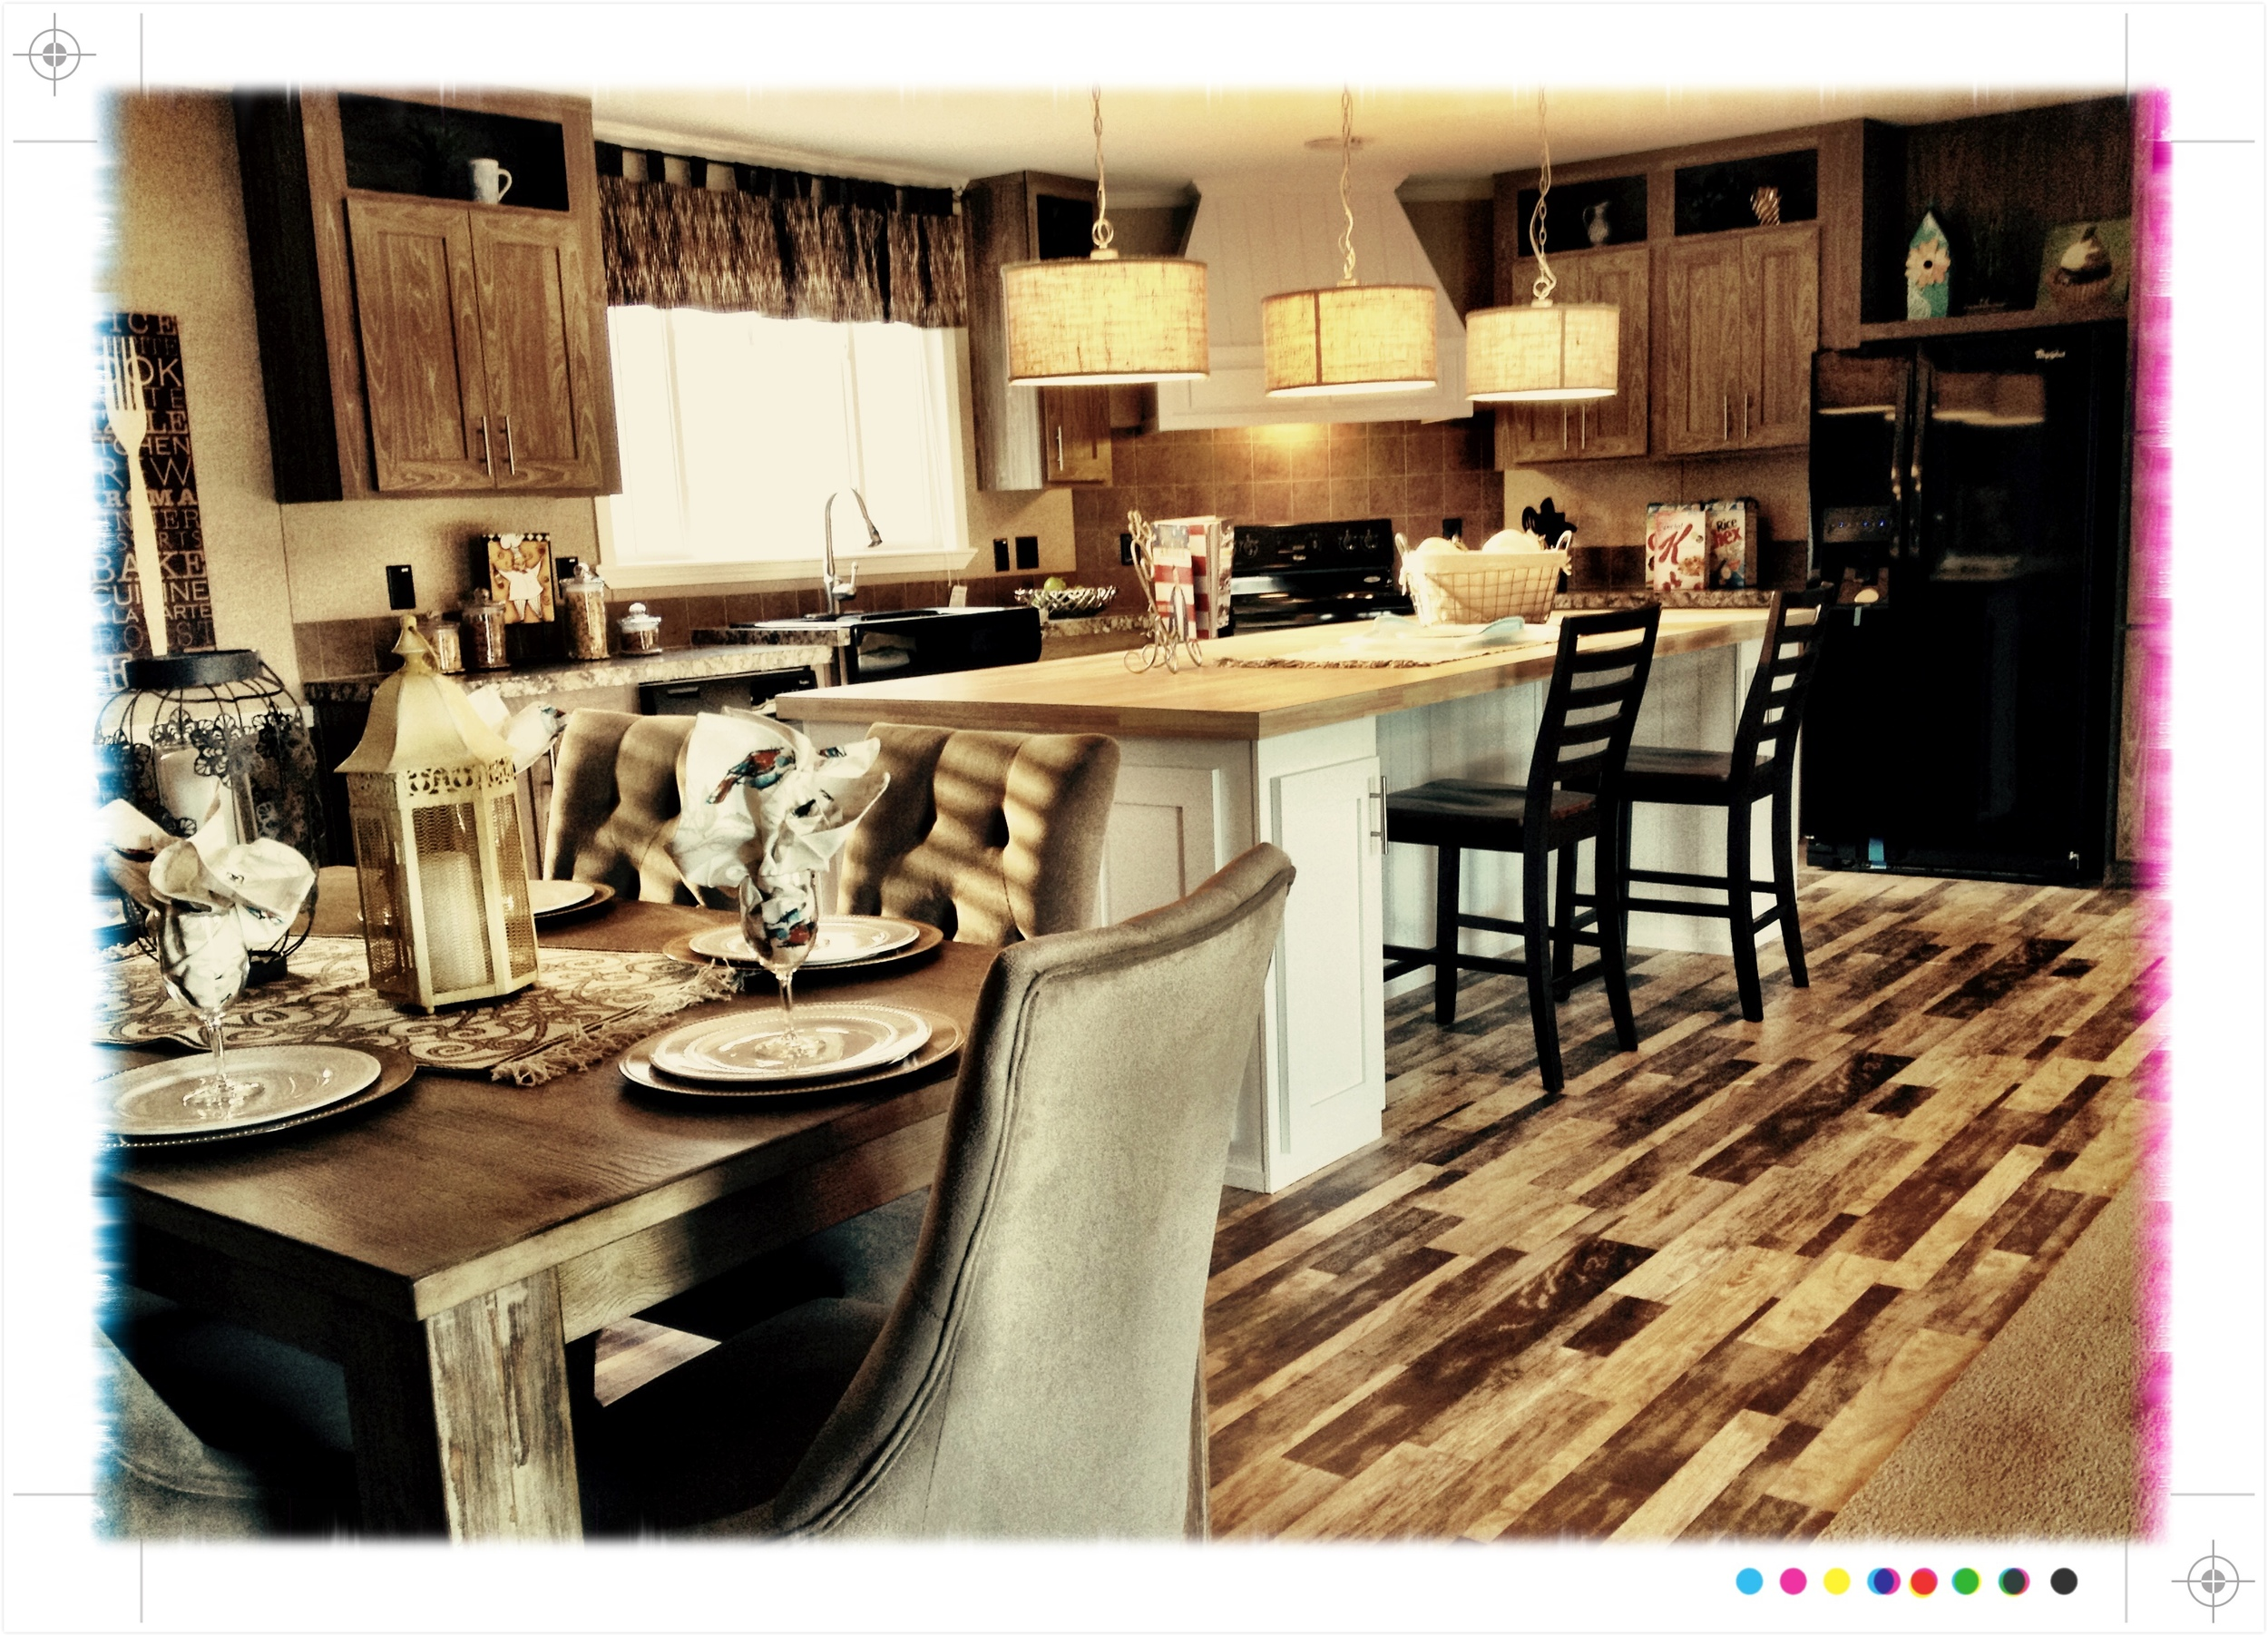 R&R Homes model by SE Homes of Texas